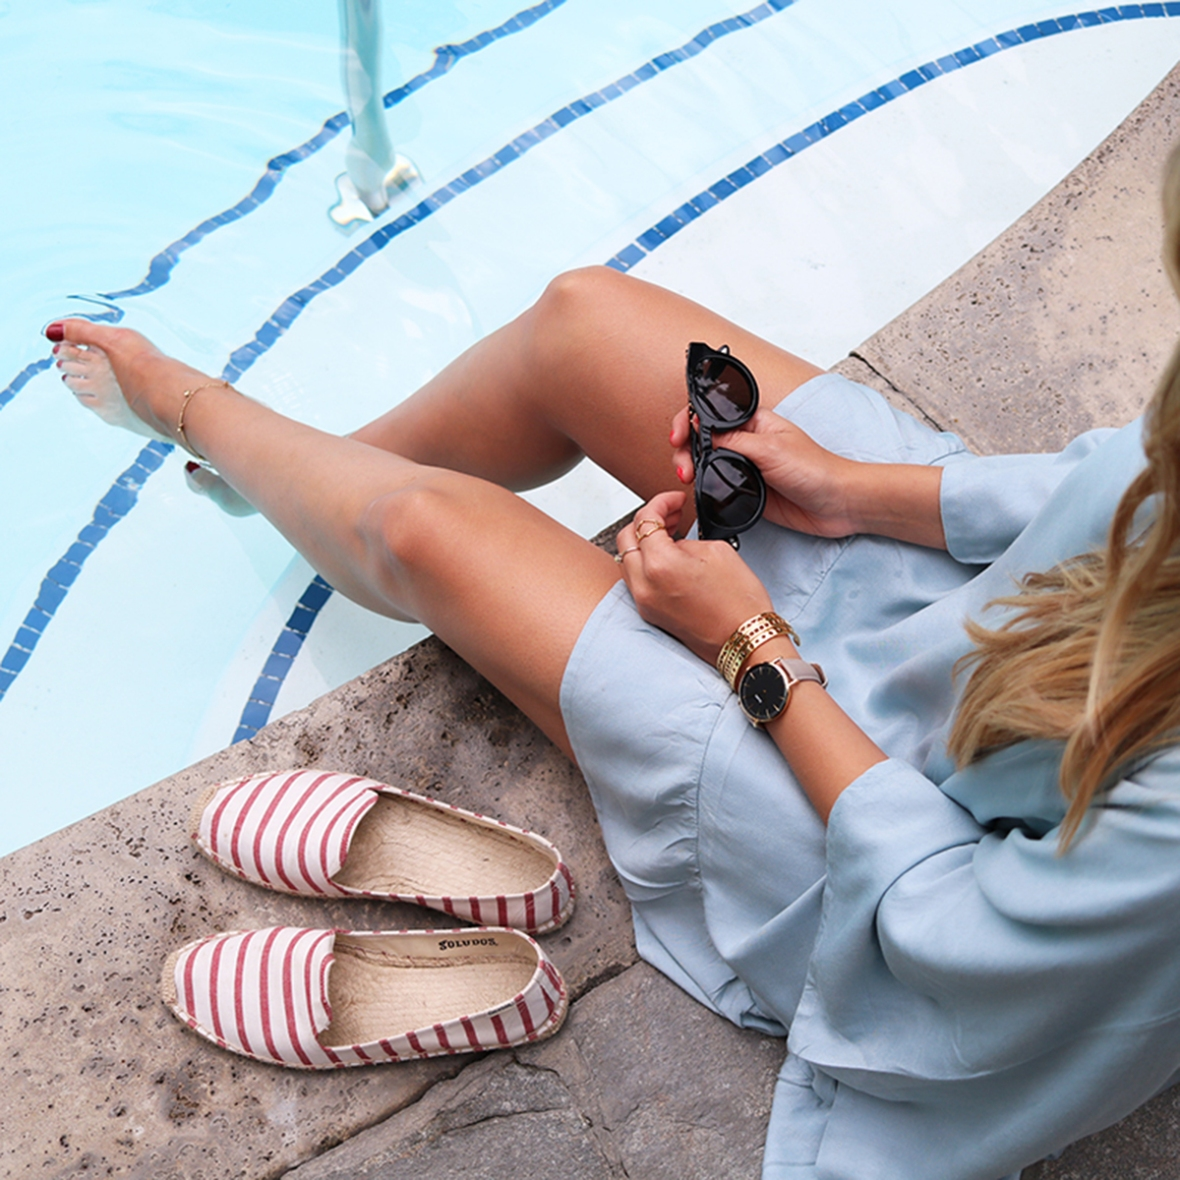 Fashion blogger Hotel Bel air Los Angeles